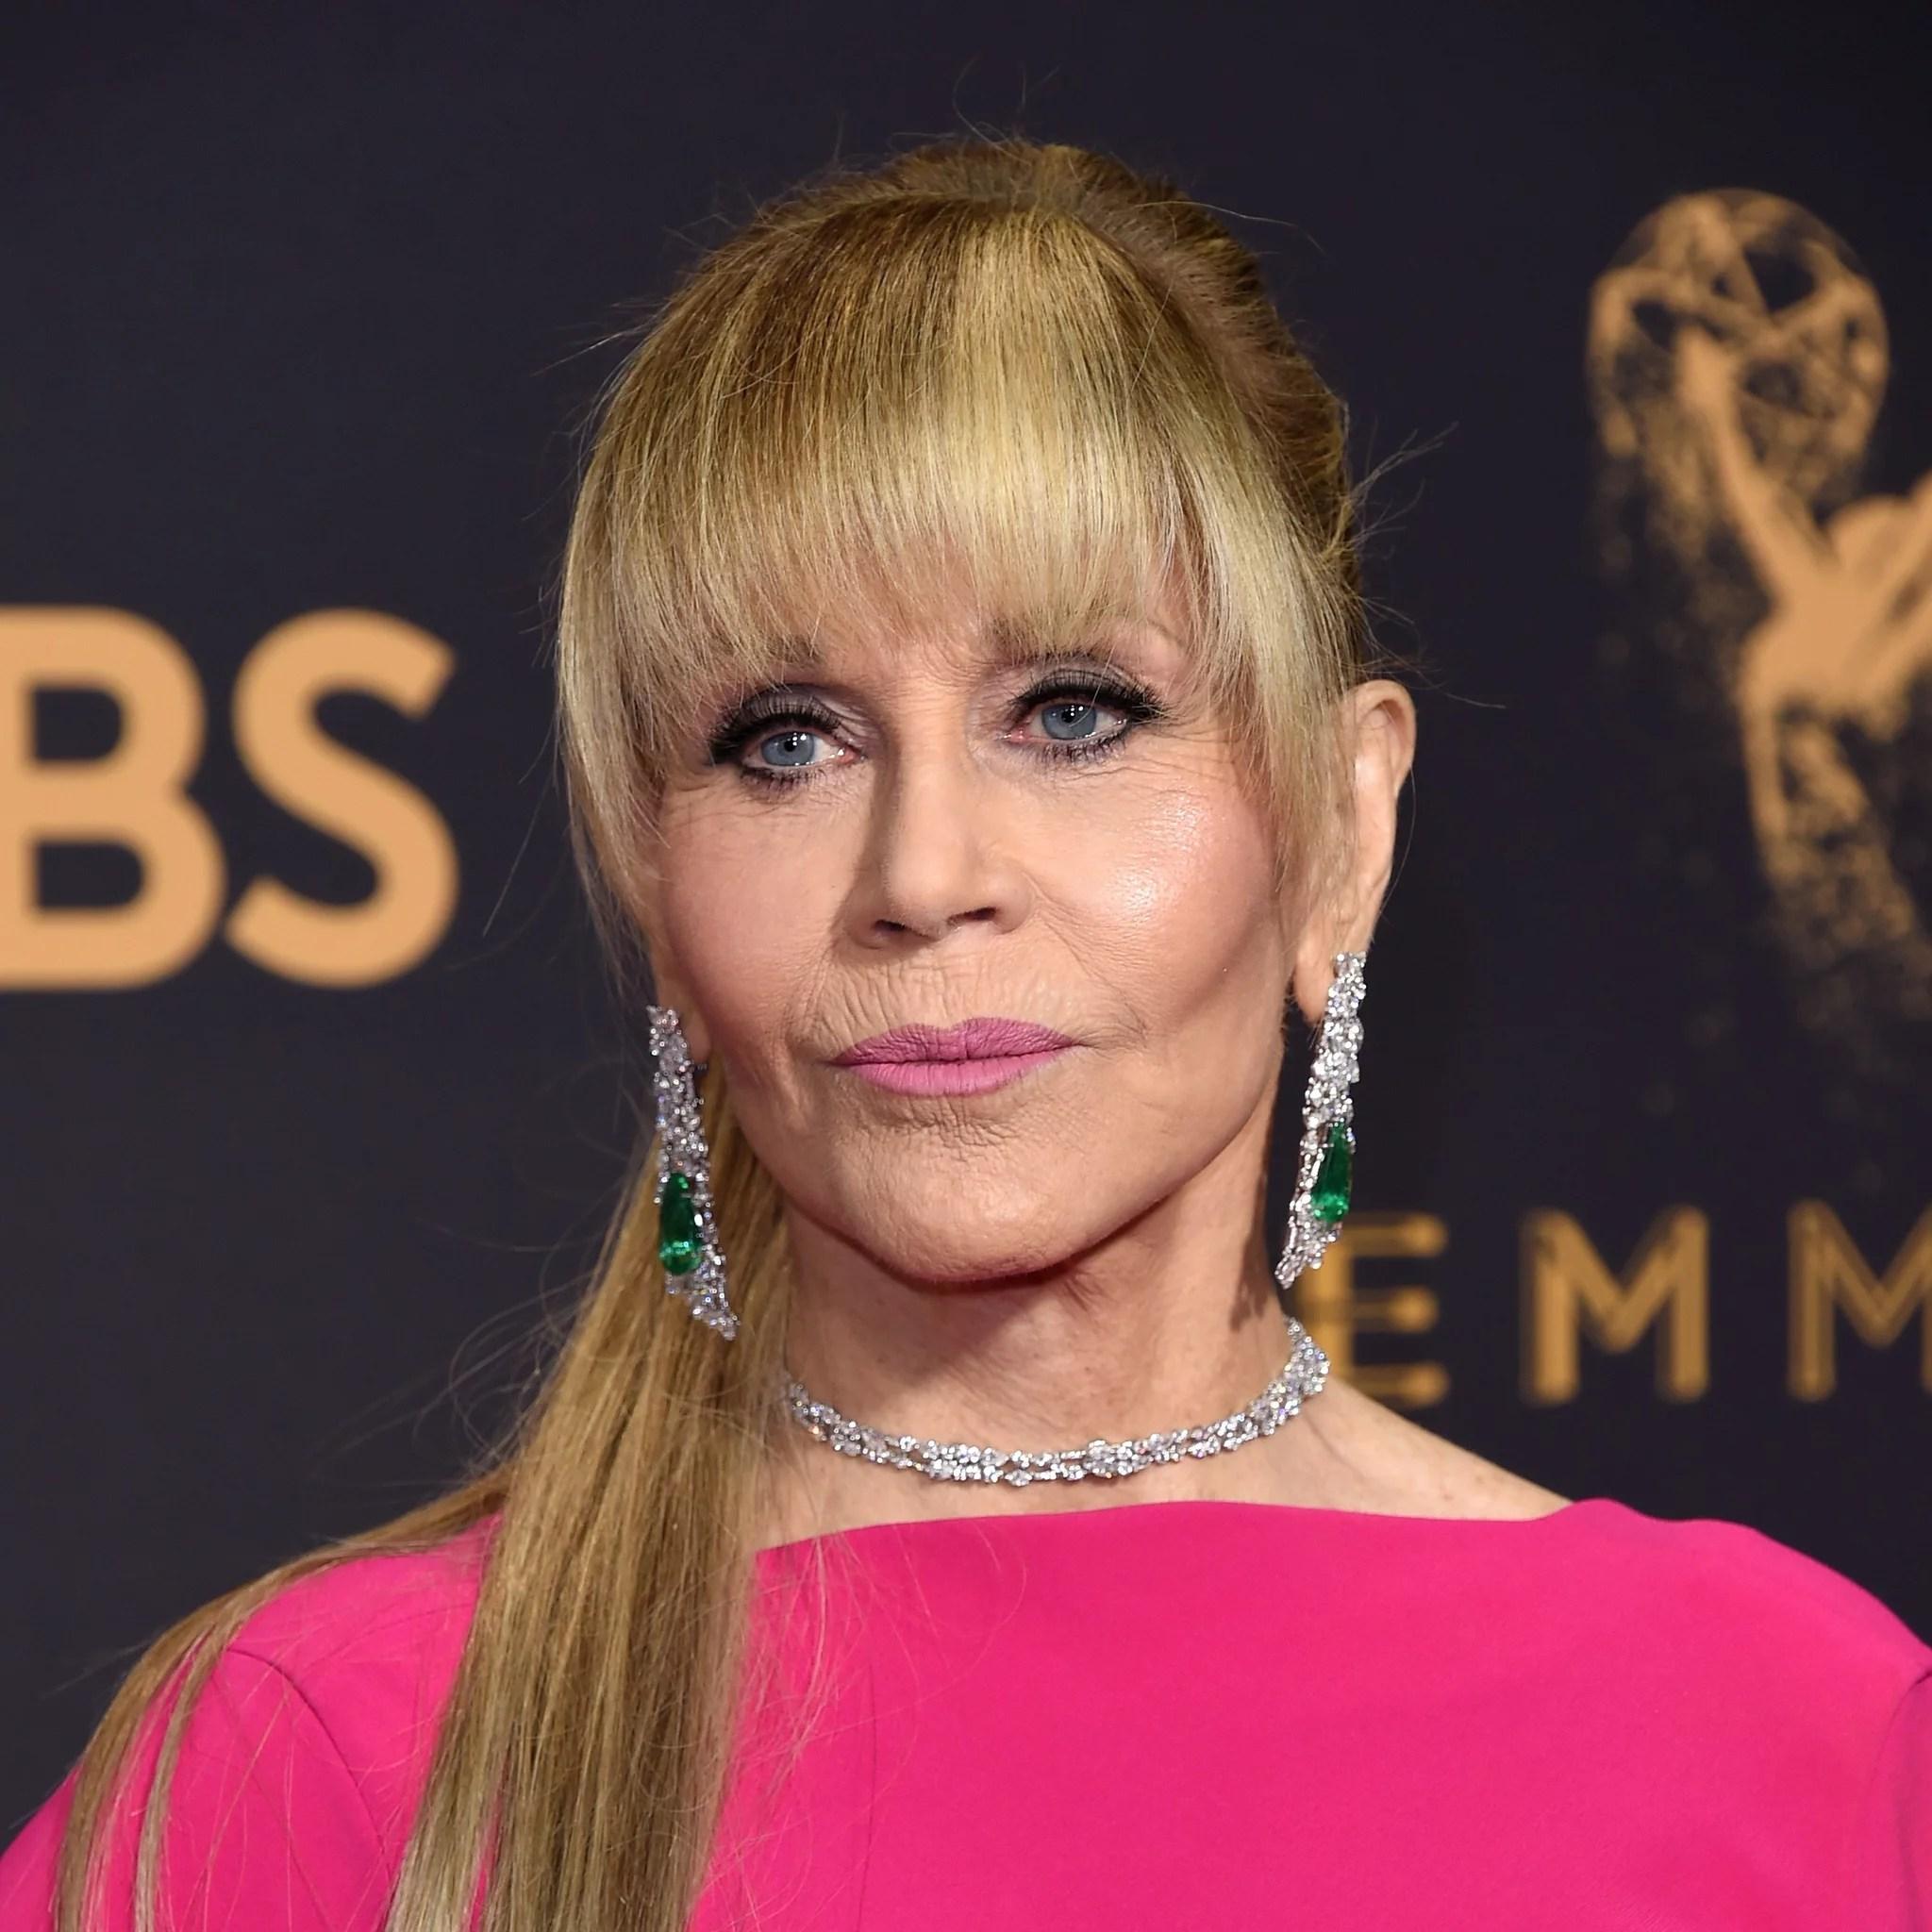 Jane Fonda s Hair at the 2017 Emmy Awards